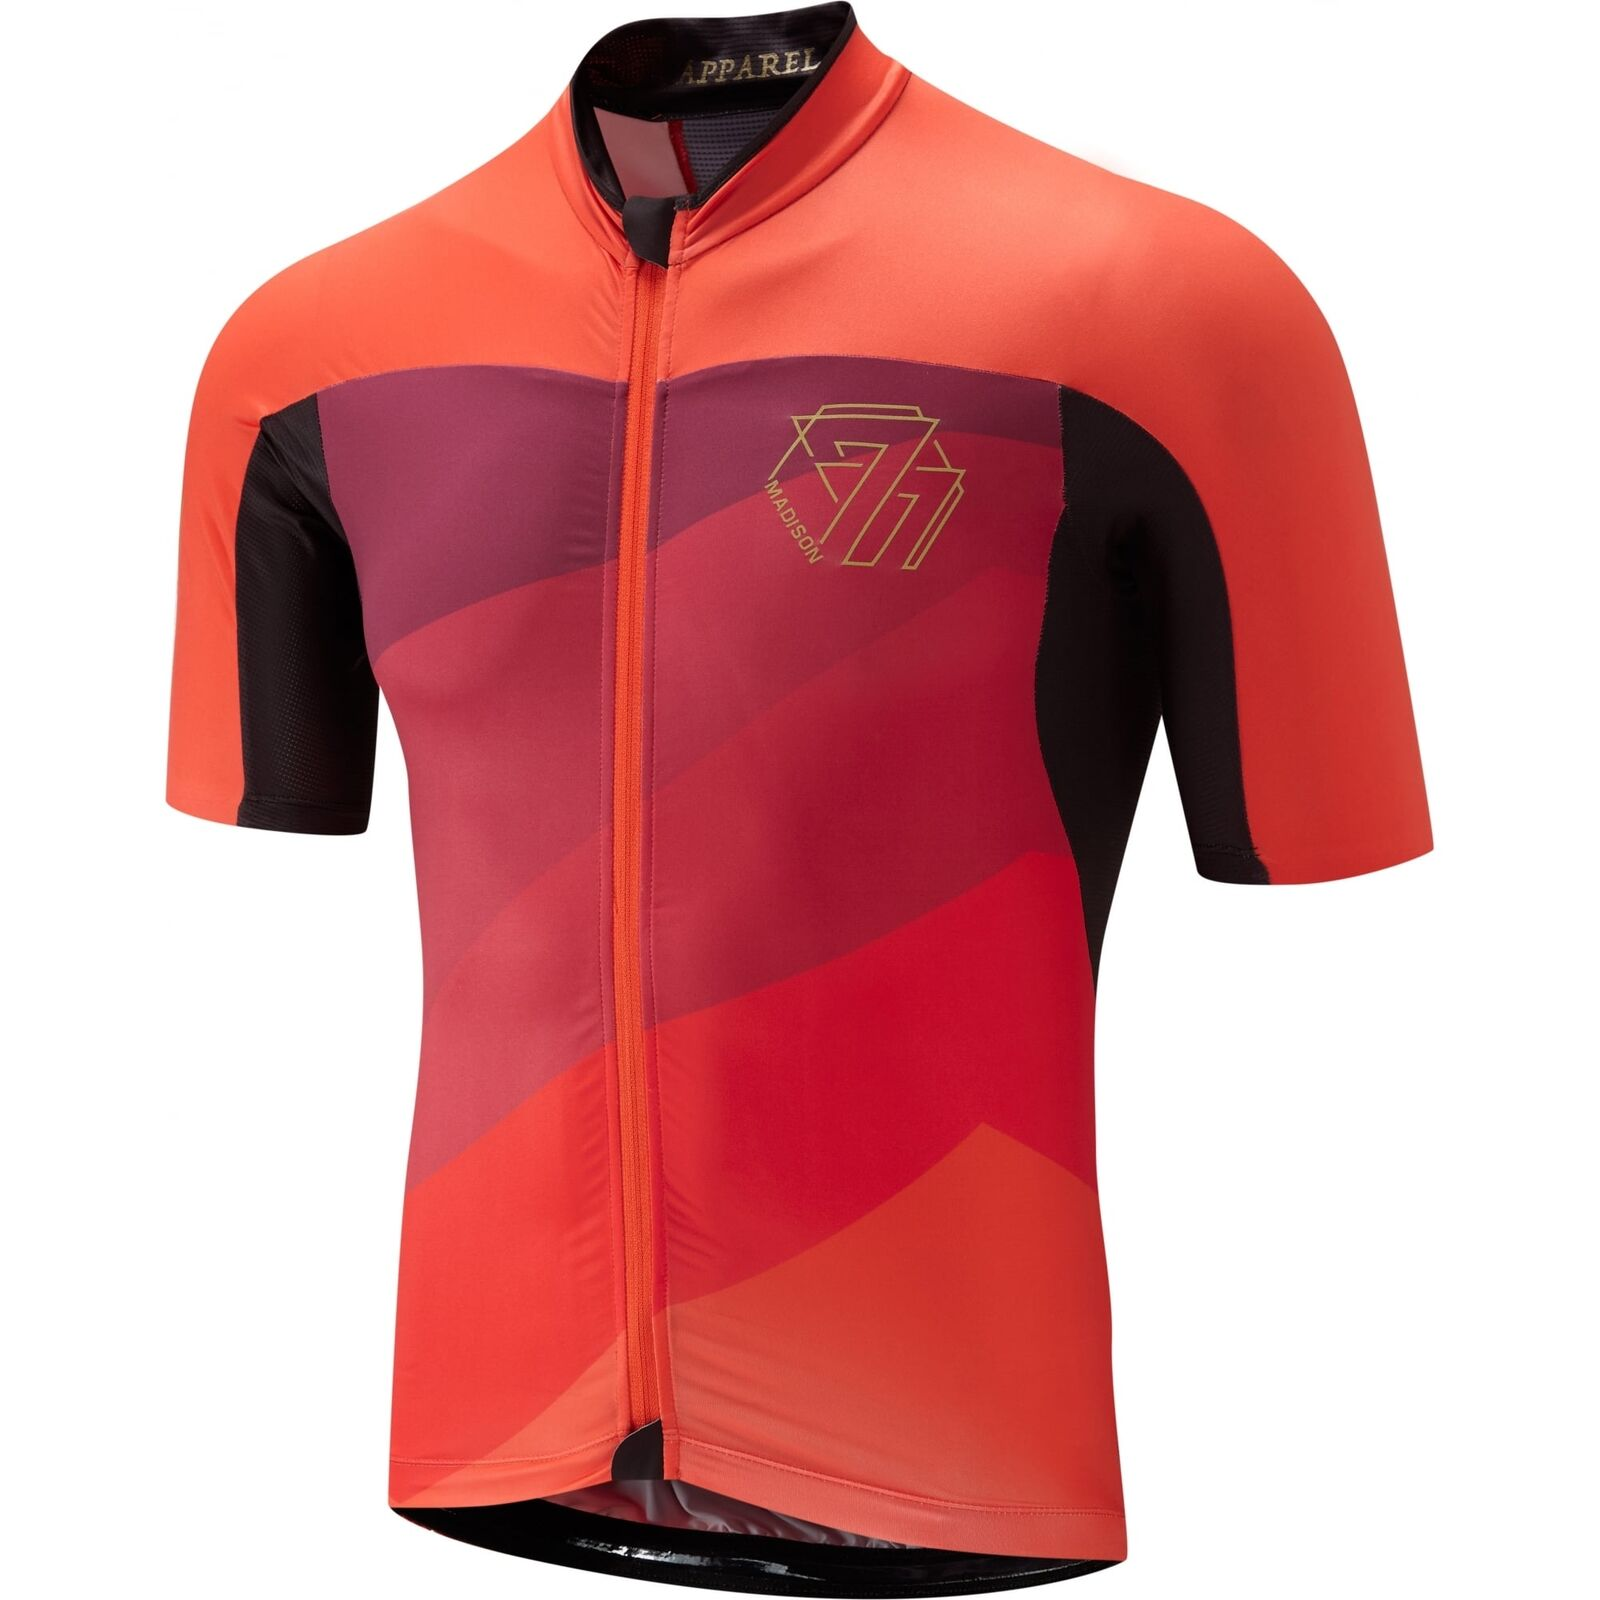 Madison  77 RoadRace Premio Men's Short Sleeve Jersey  discount promotions